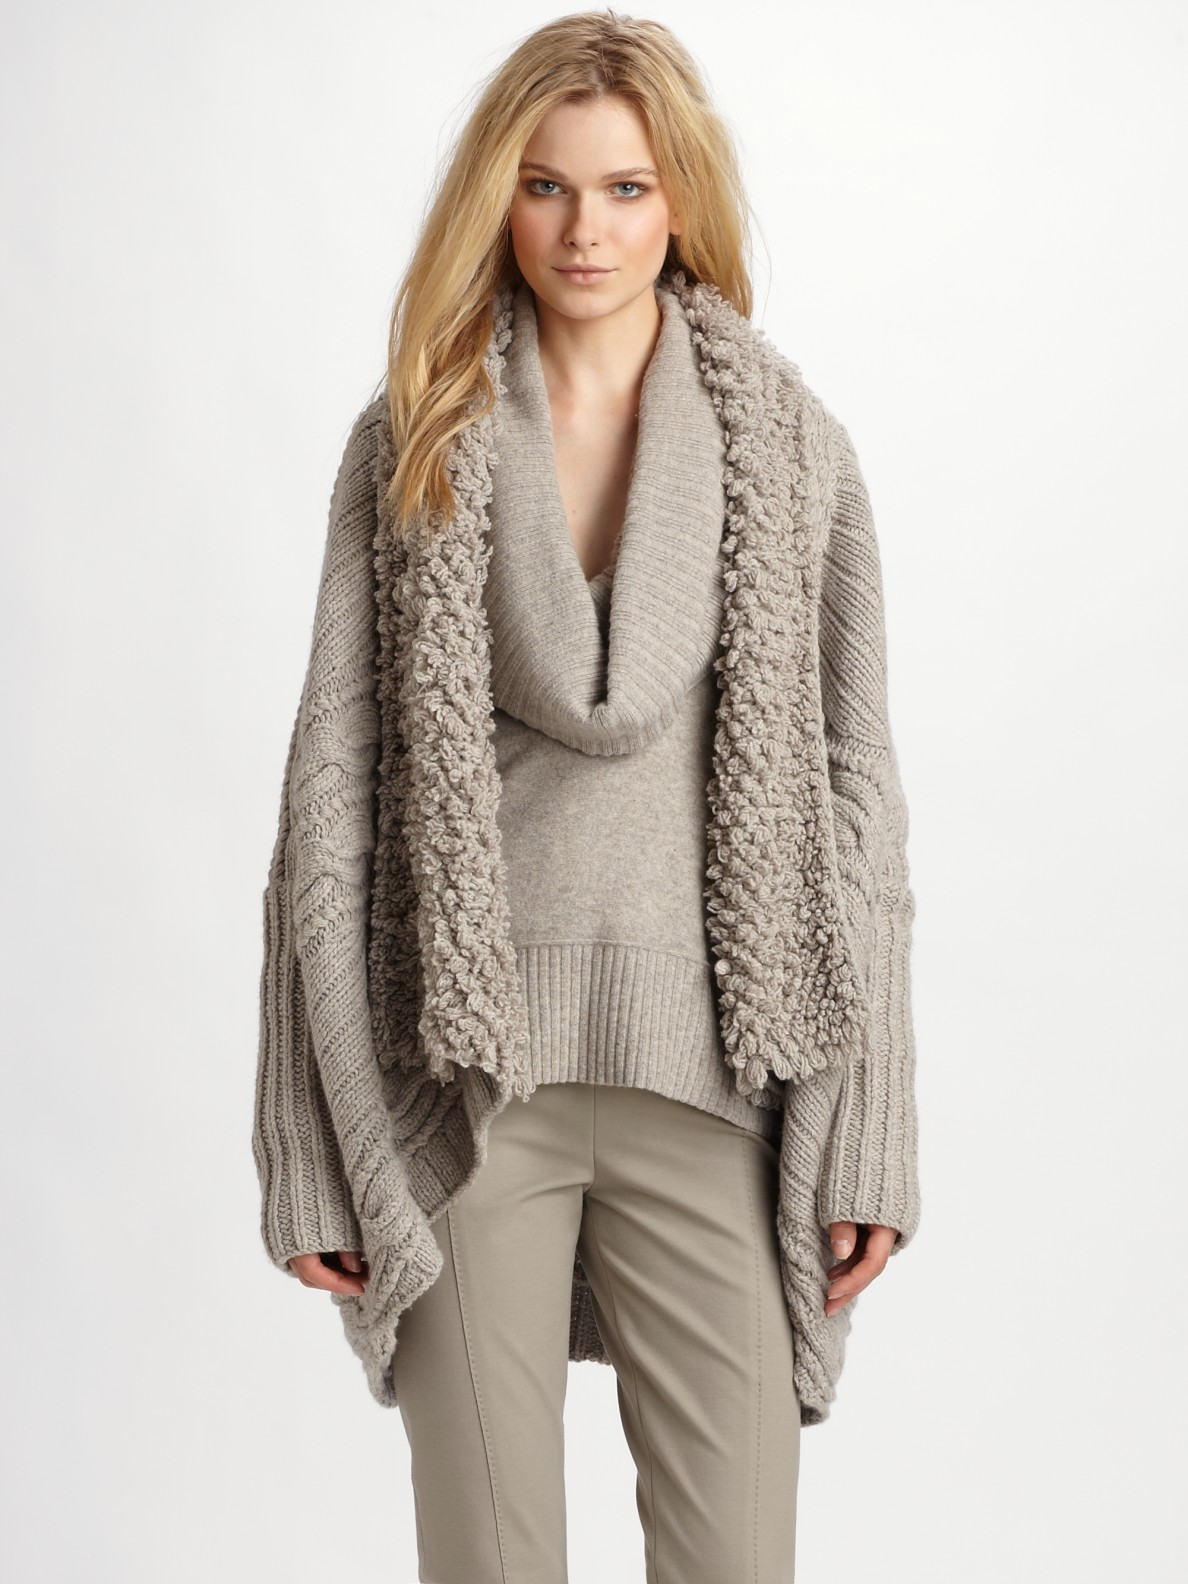 Donna Karan Wool Cashmere Cardigan Coat In Natural Lyst